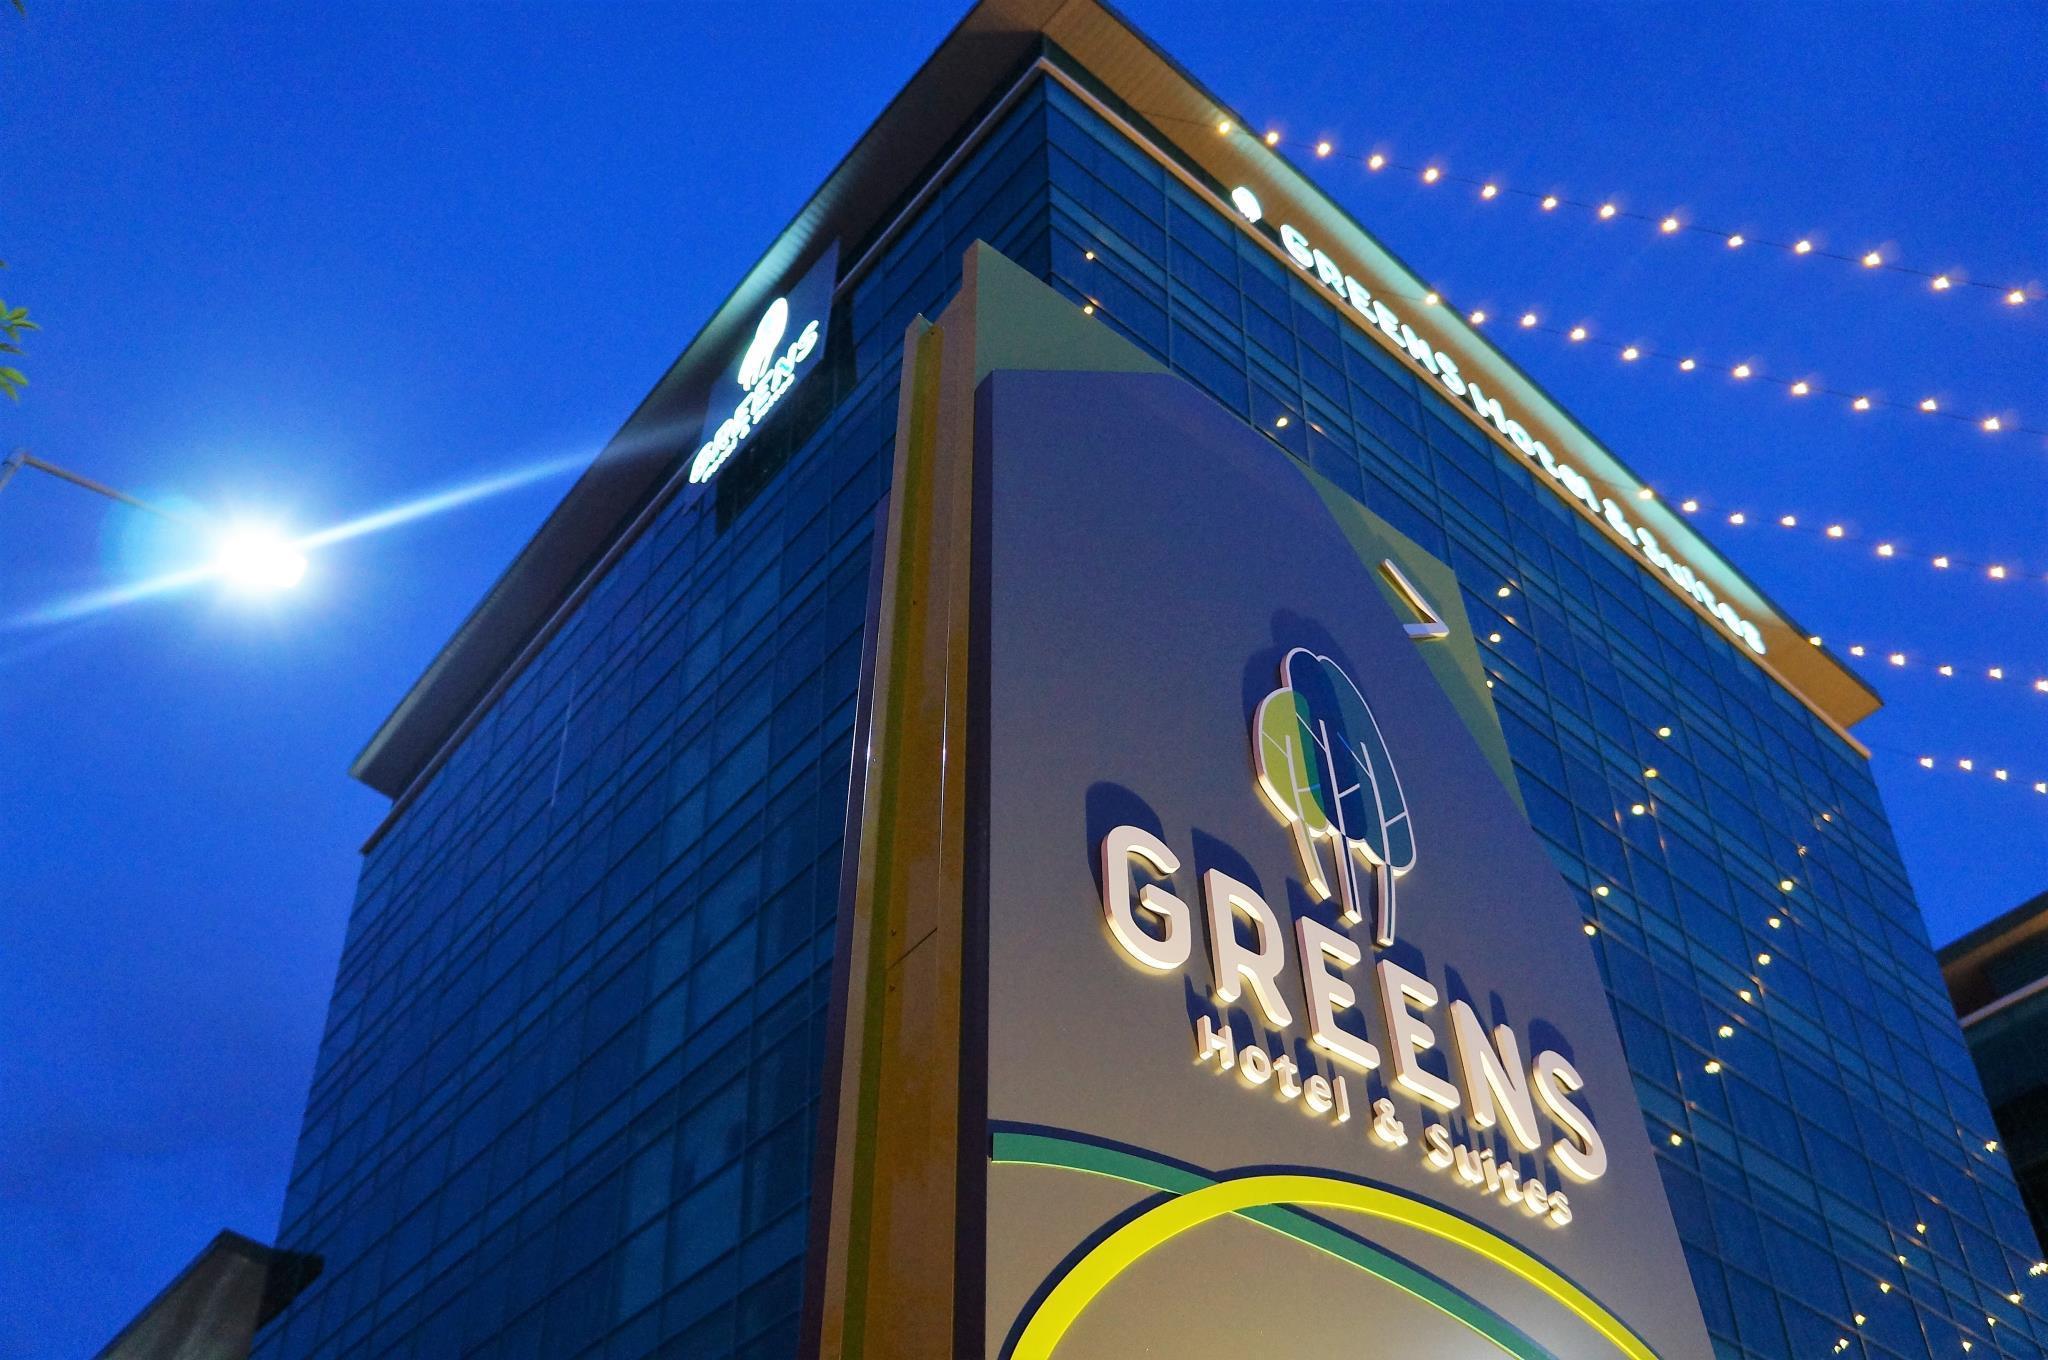 Greens Hotel & Suites